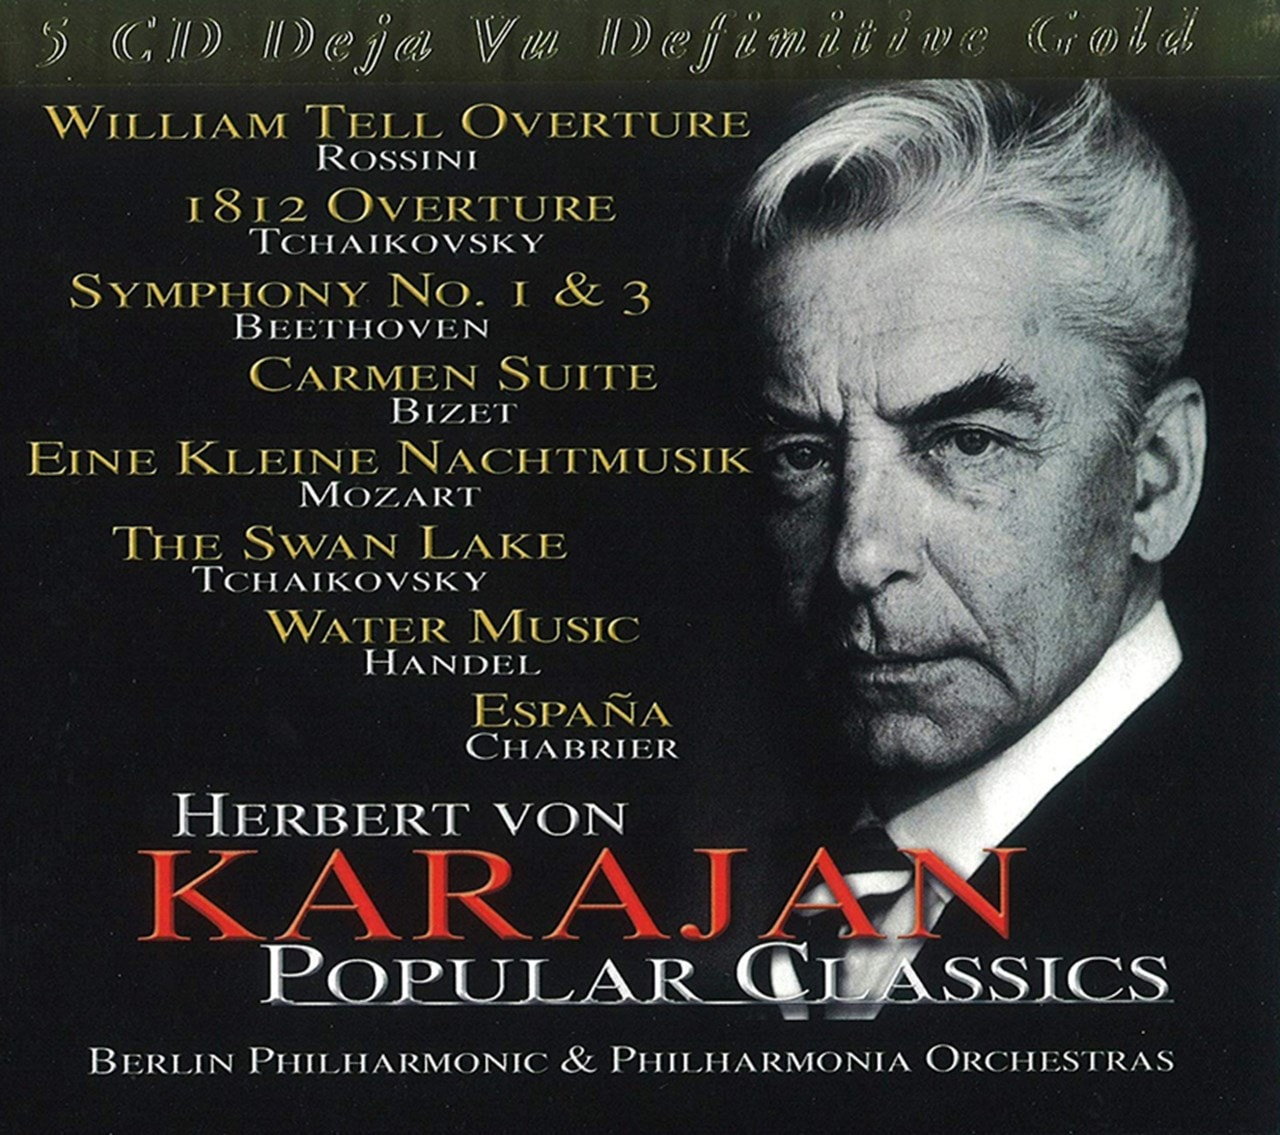 Herbert Von Karajan: Popular Classics - 1